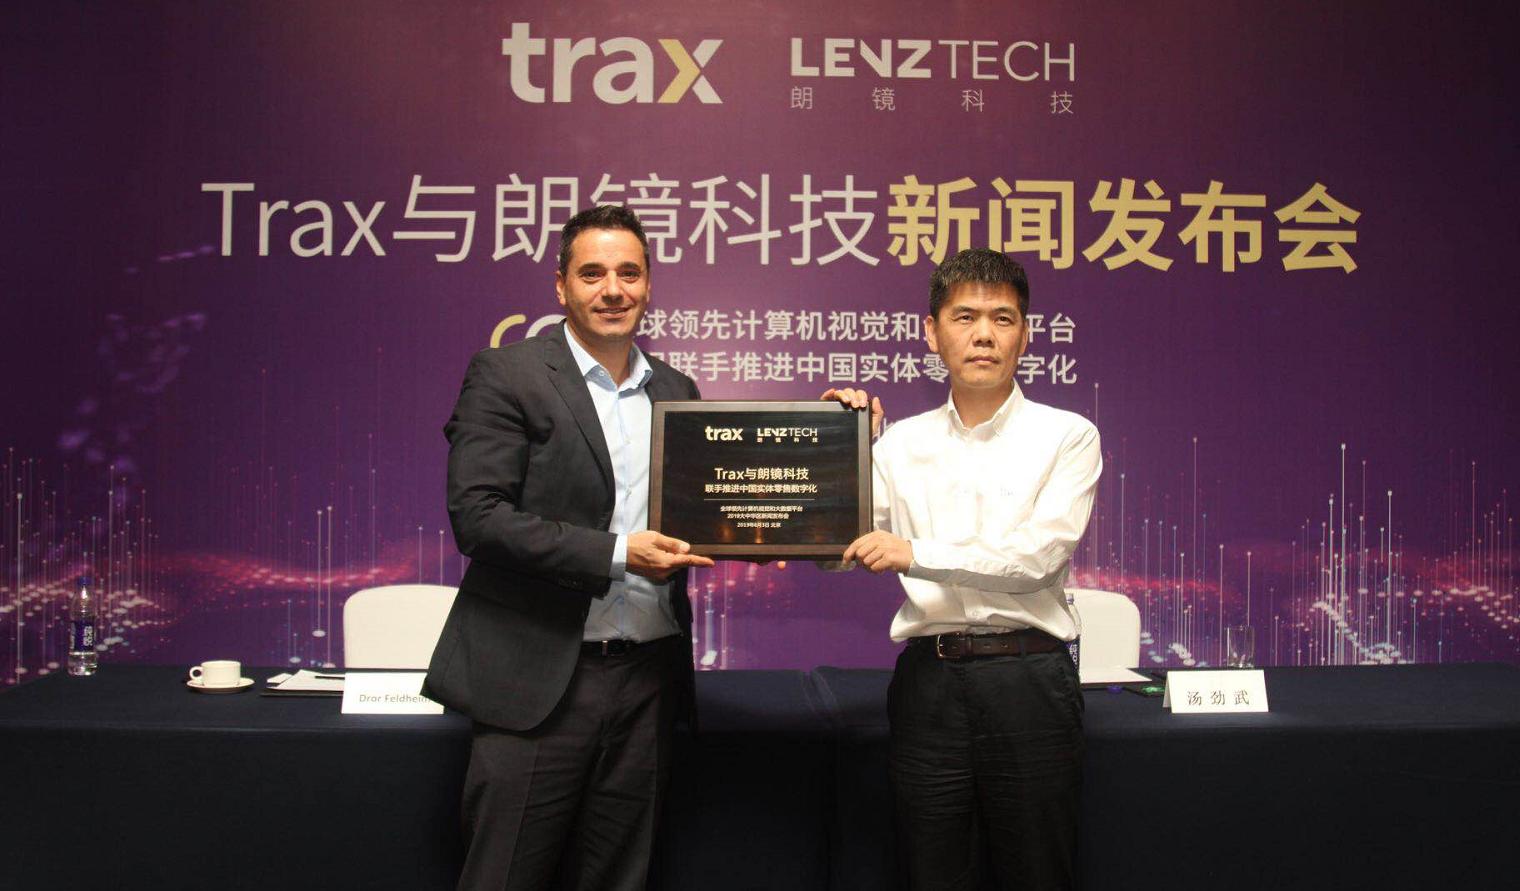 Trax与朗镜科技携手 以中国的规模和速度推进实体零售数字化